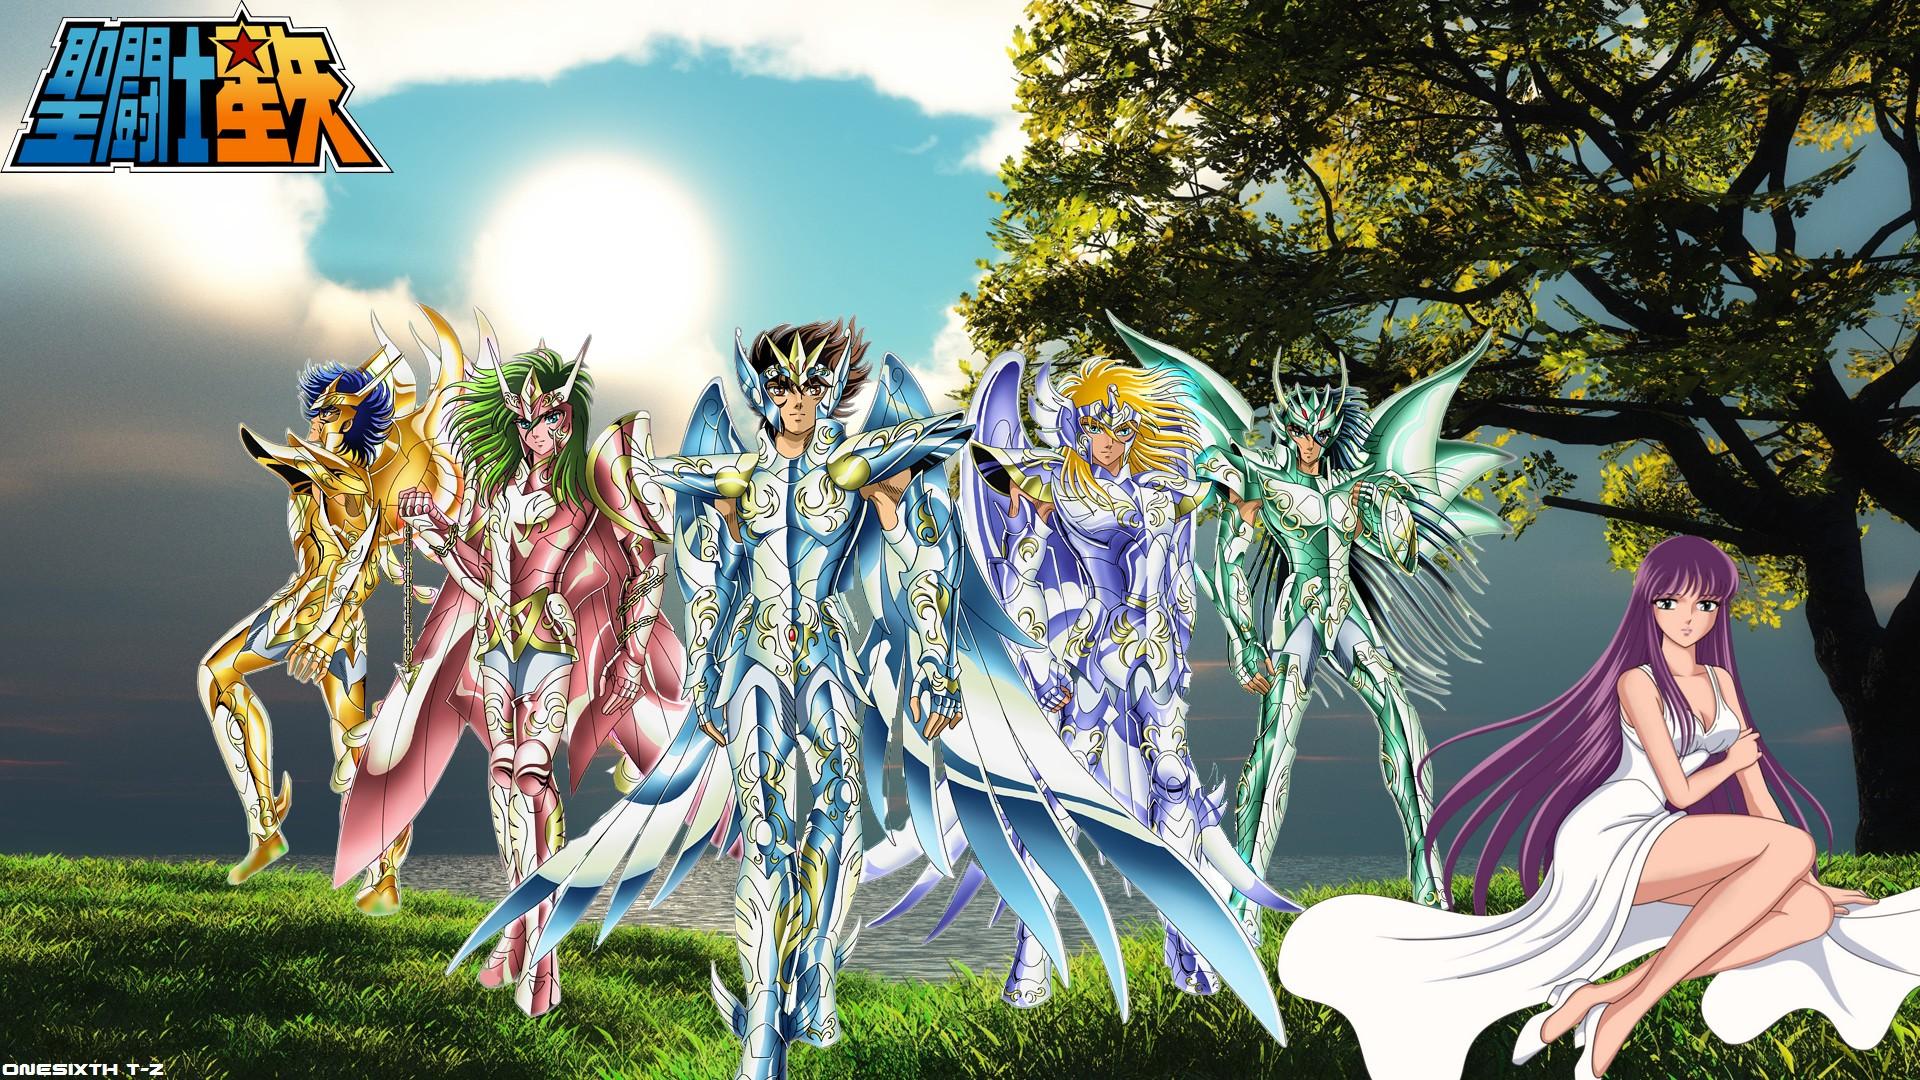 Saint Seiya Wallpapers HD - WallpaperSafari